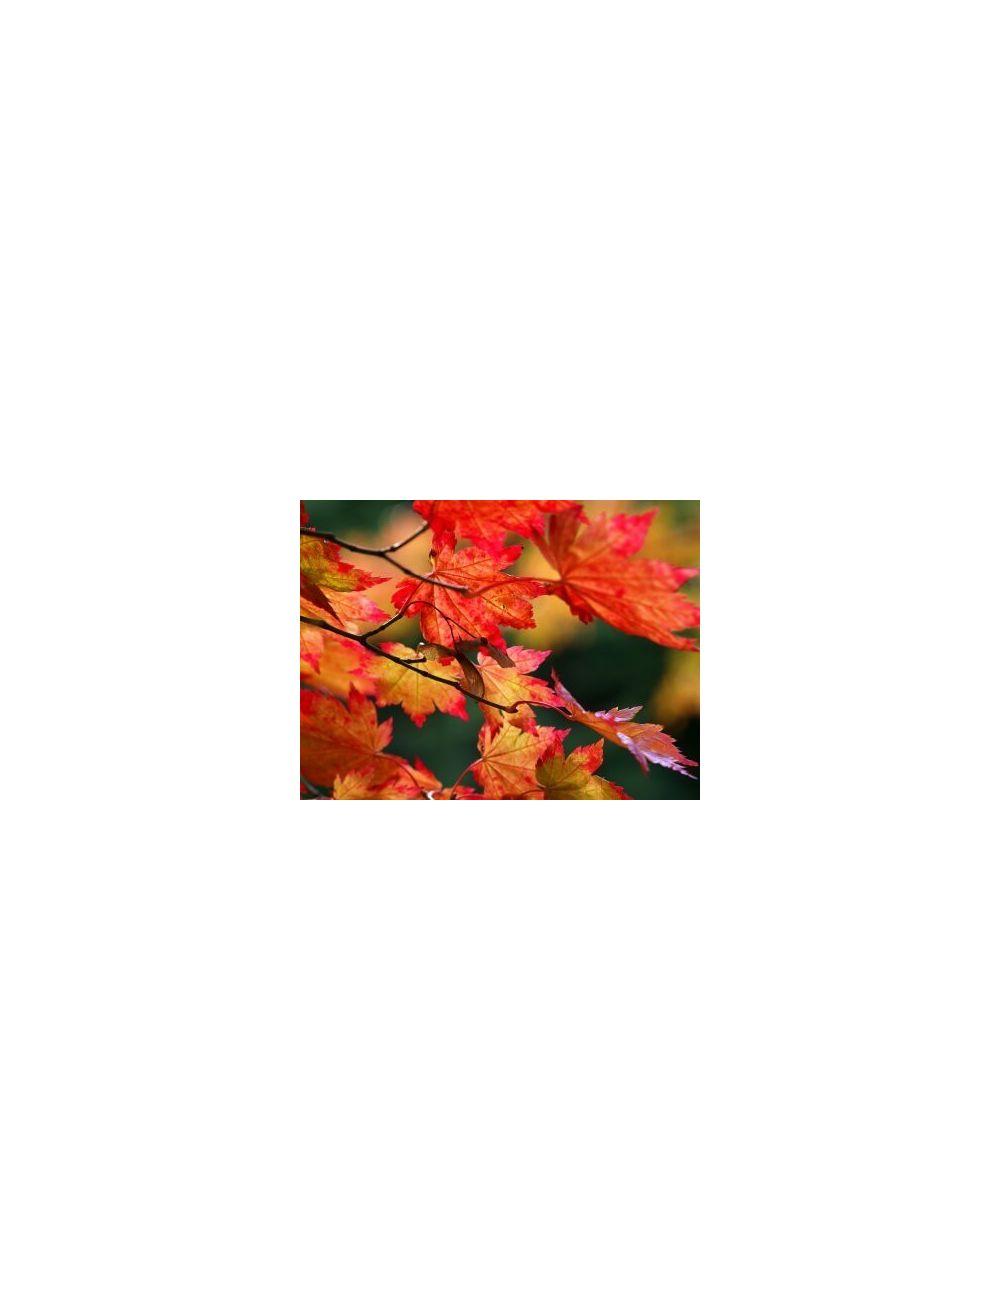 Acero giapponese vitifolium vendita piante on line for Acero giapponese in vaso